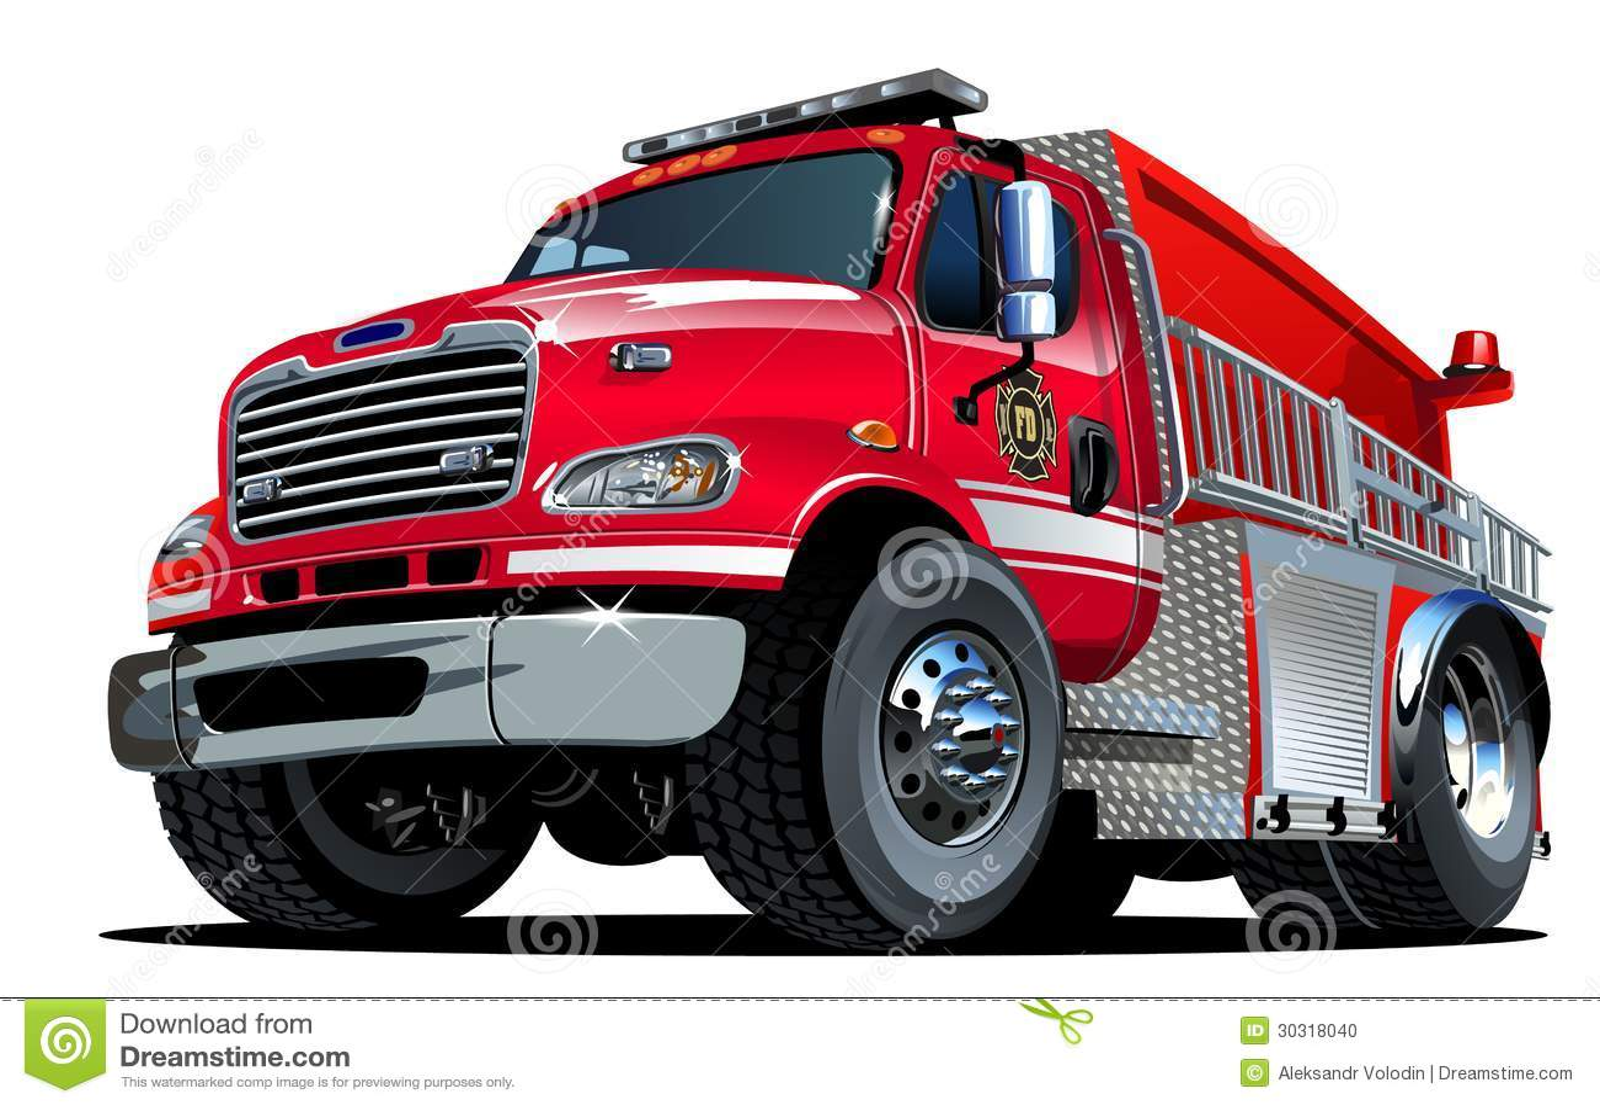 Vector Cartoon Fire Truck Stock Photo - Image: 30318040